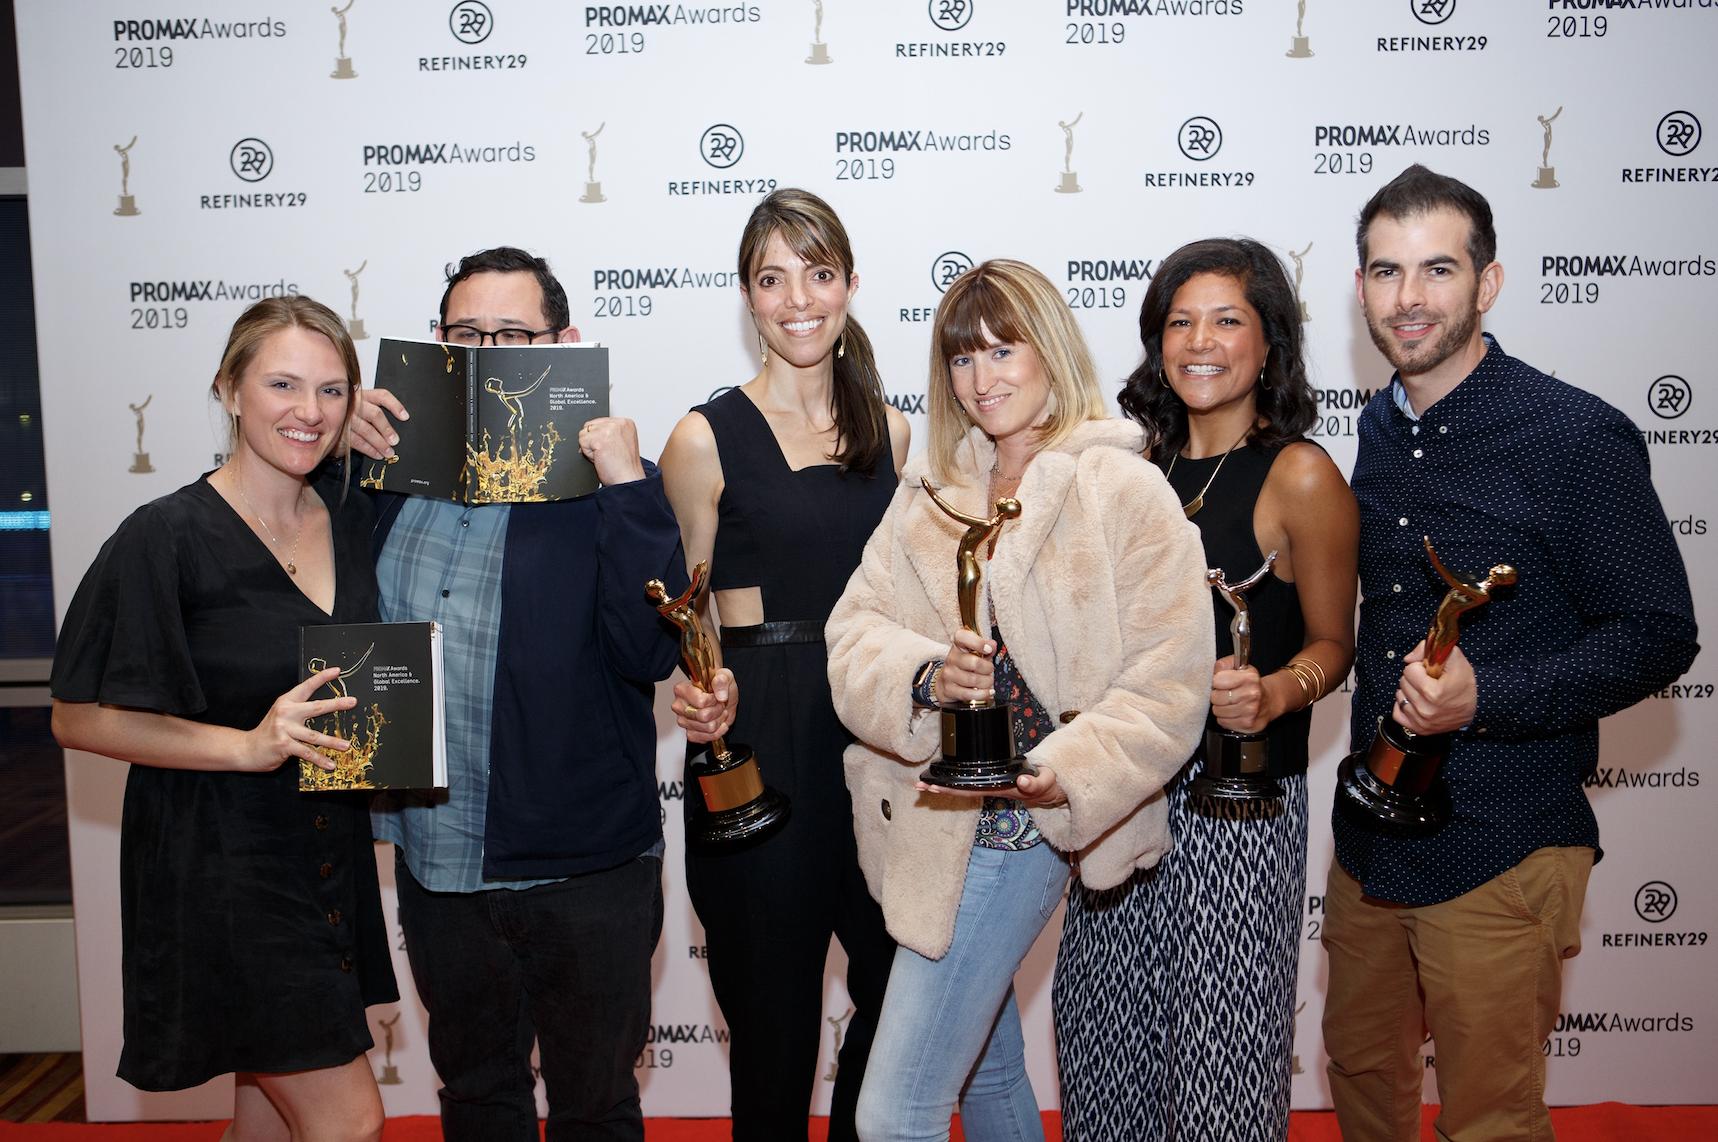 photo of promax awards